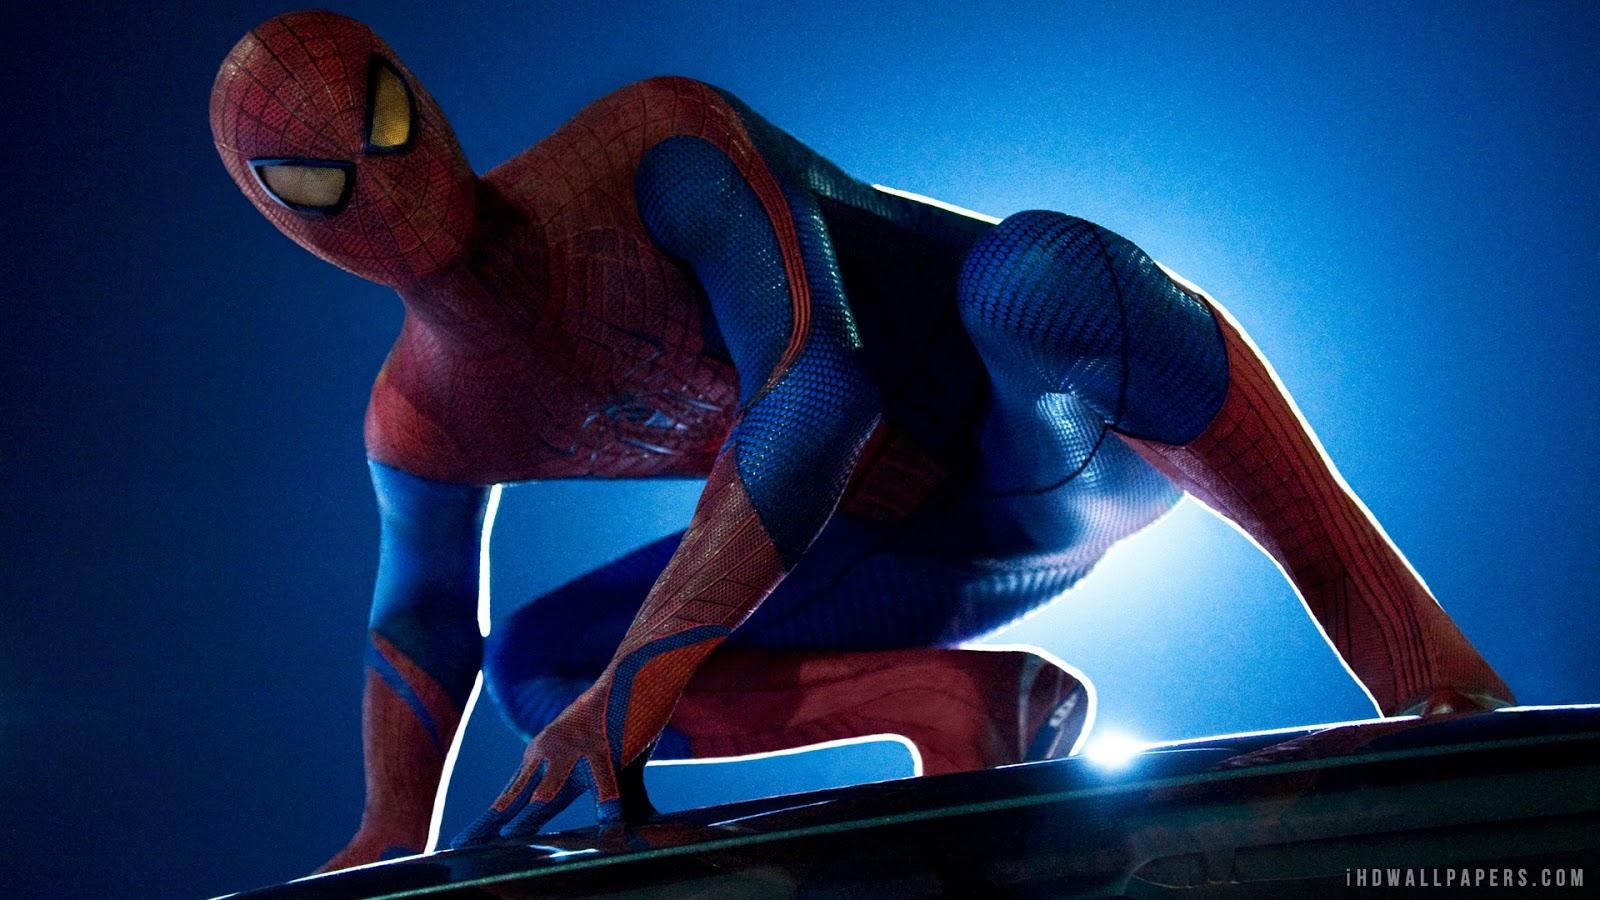 Spiderman 1920x1080 Image HD